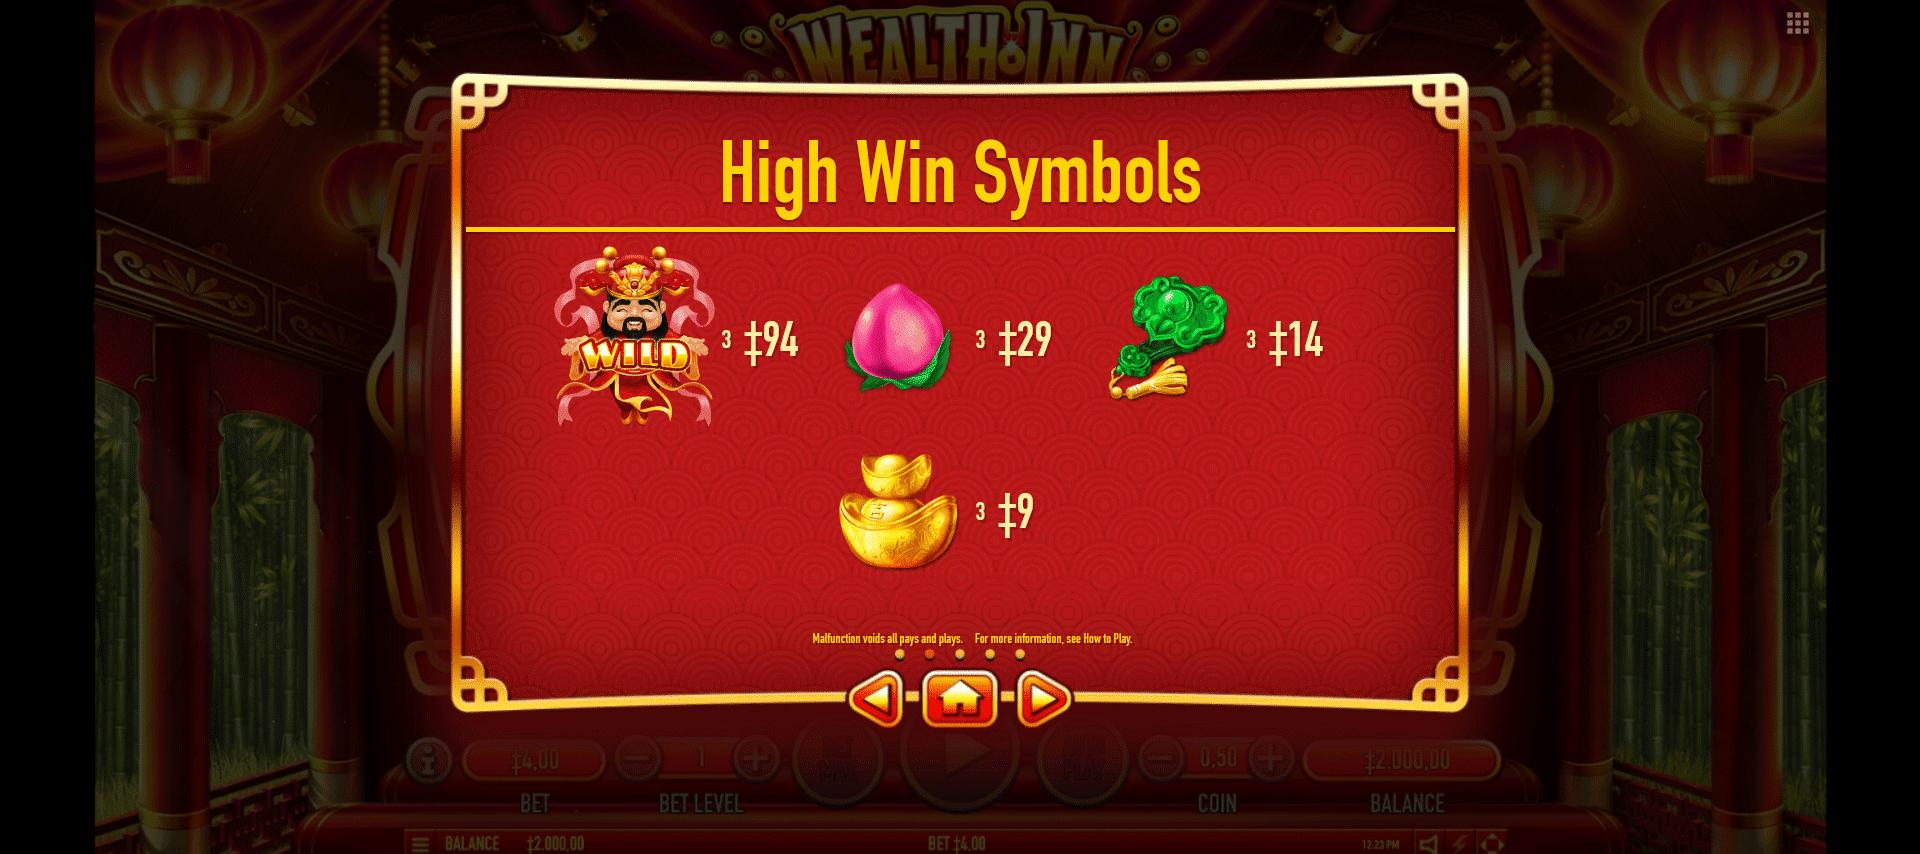 paytable dei simboli della slot online wealth inn